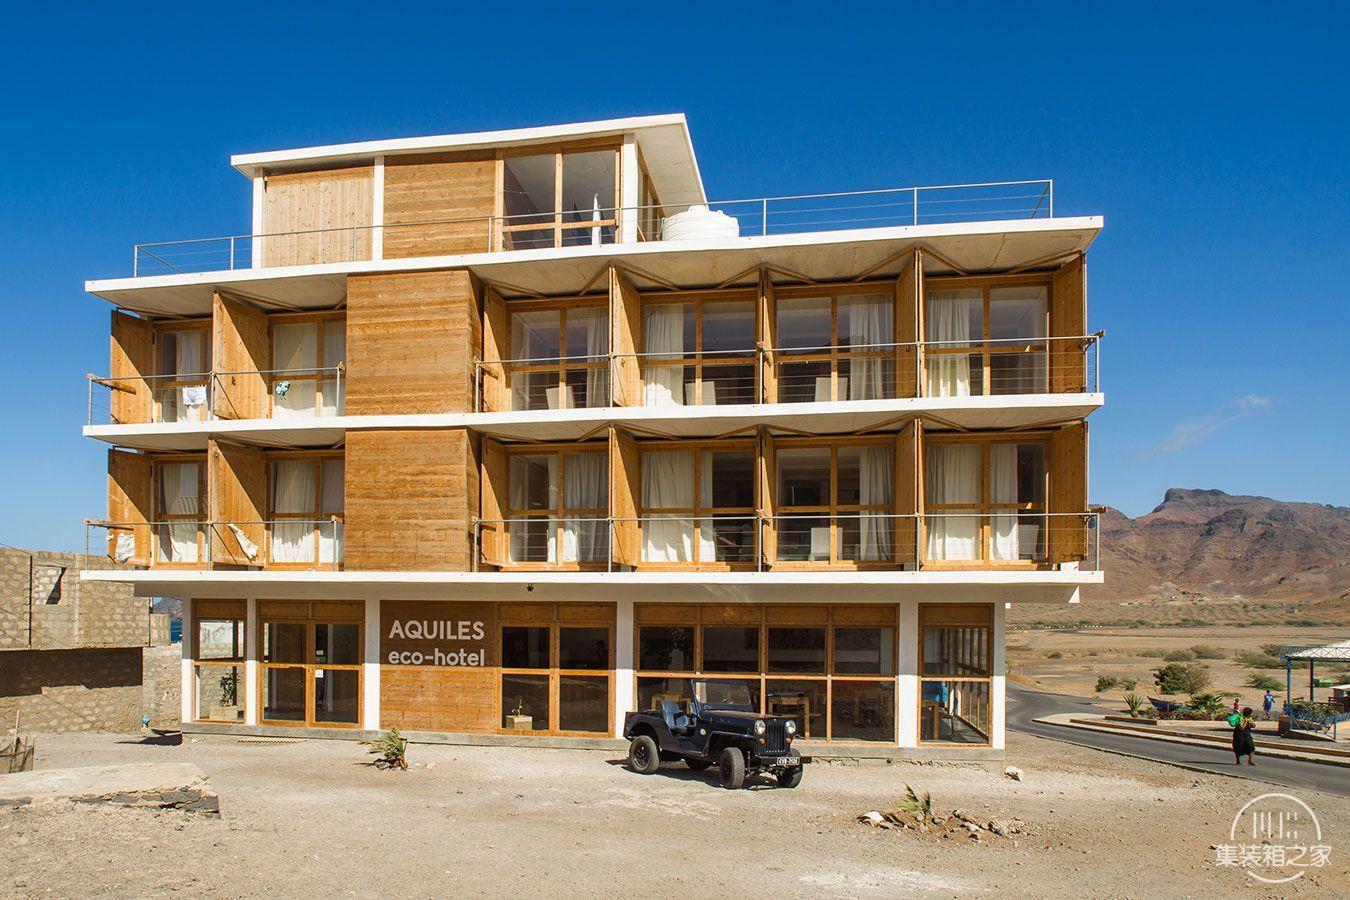 acquiles_eco_hotel_07_Ramos_Castellano_Architects.jpg